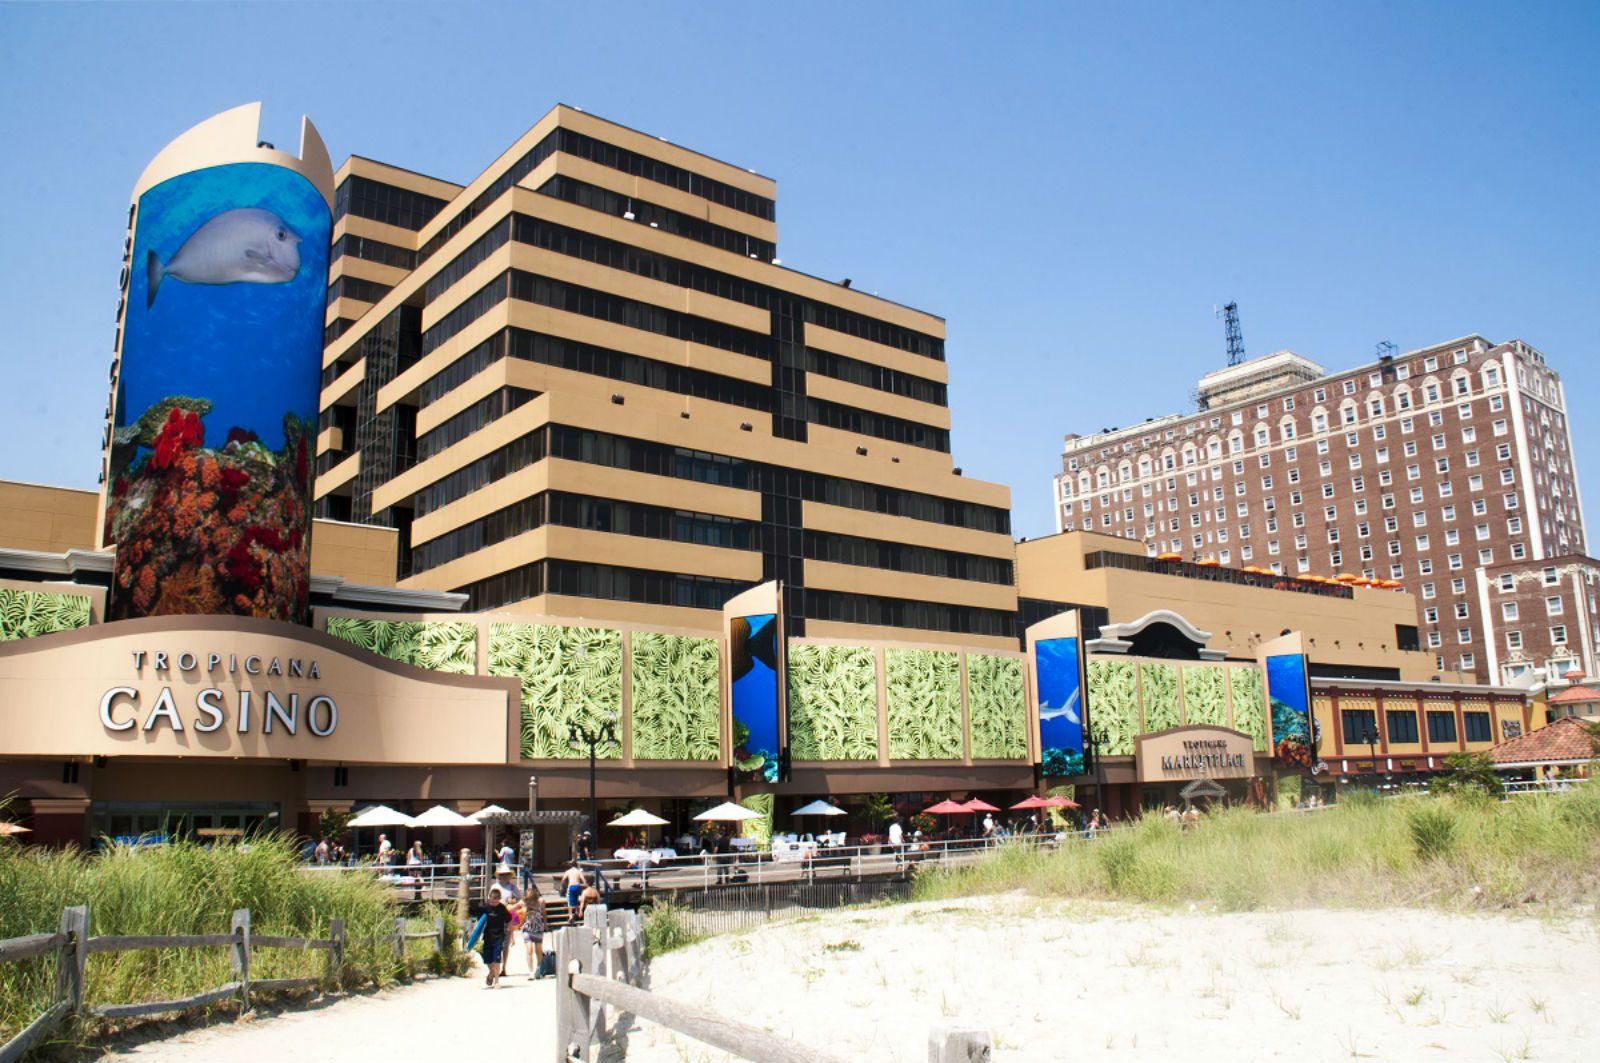 Eldorado Resorts Takes Control Of Tropicana Atlantic City Fires Entire Online Gaming Team Best Online Casino Tropicana Hotel Online Casino Games